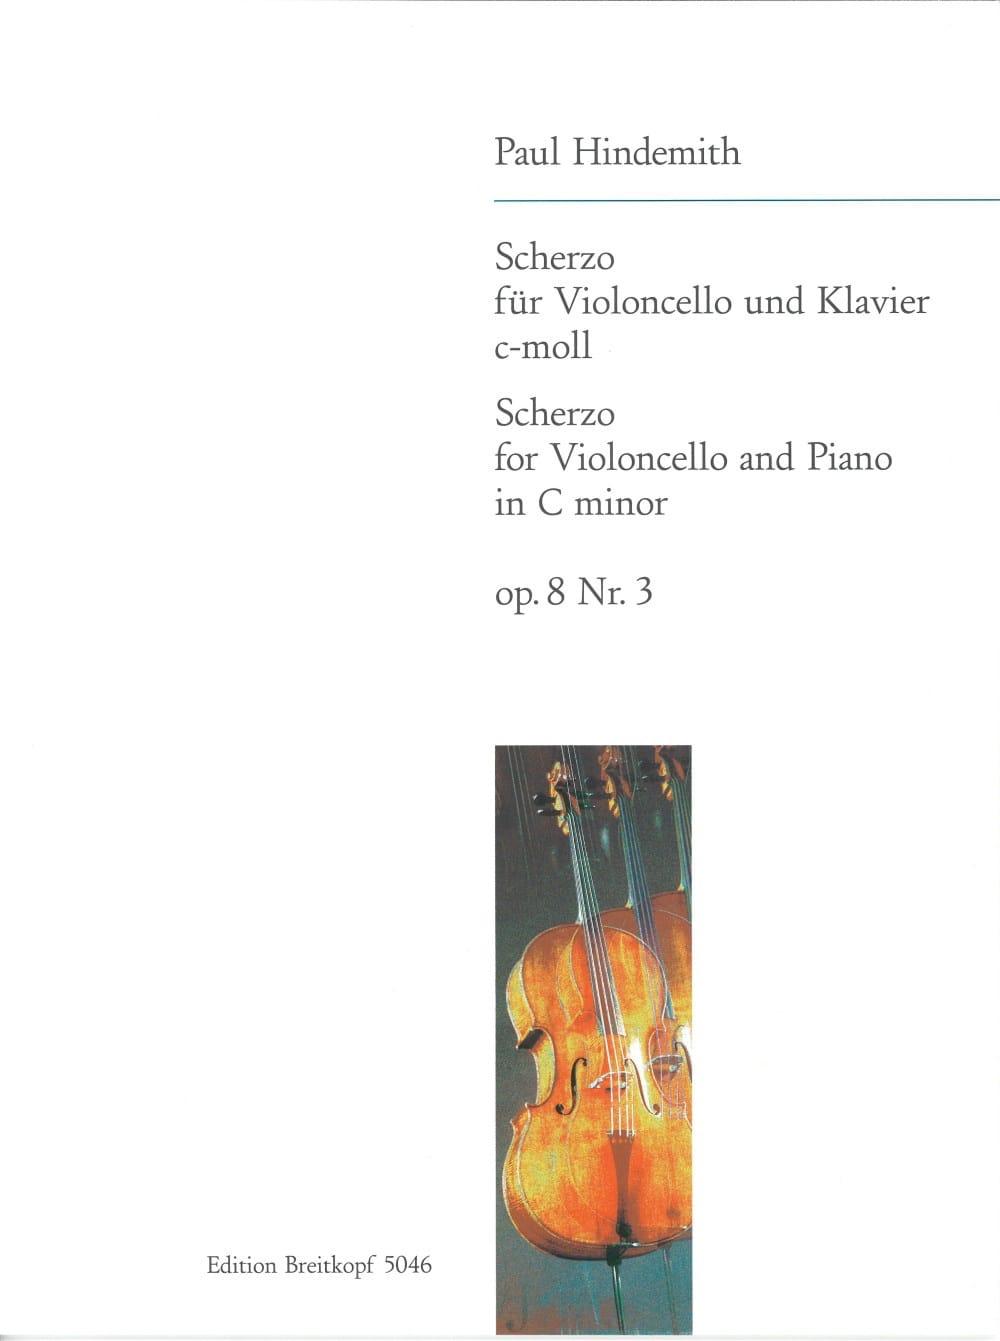 Scherzo c-moll op. 8 n° 3 - HINDEMITH - Partition - laflutedepan.com